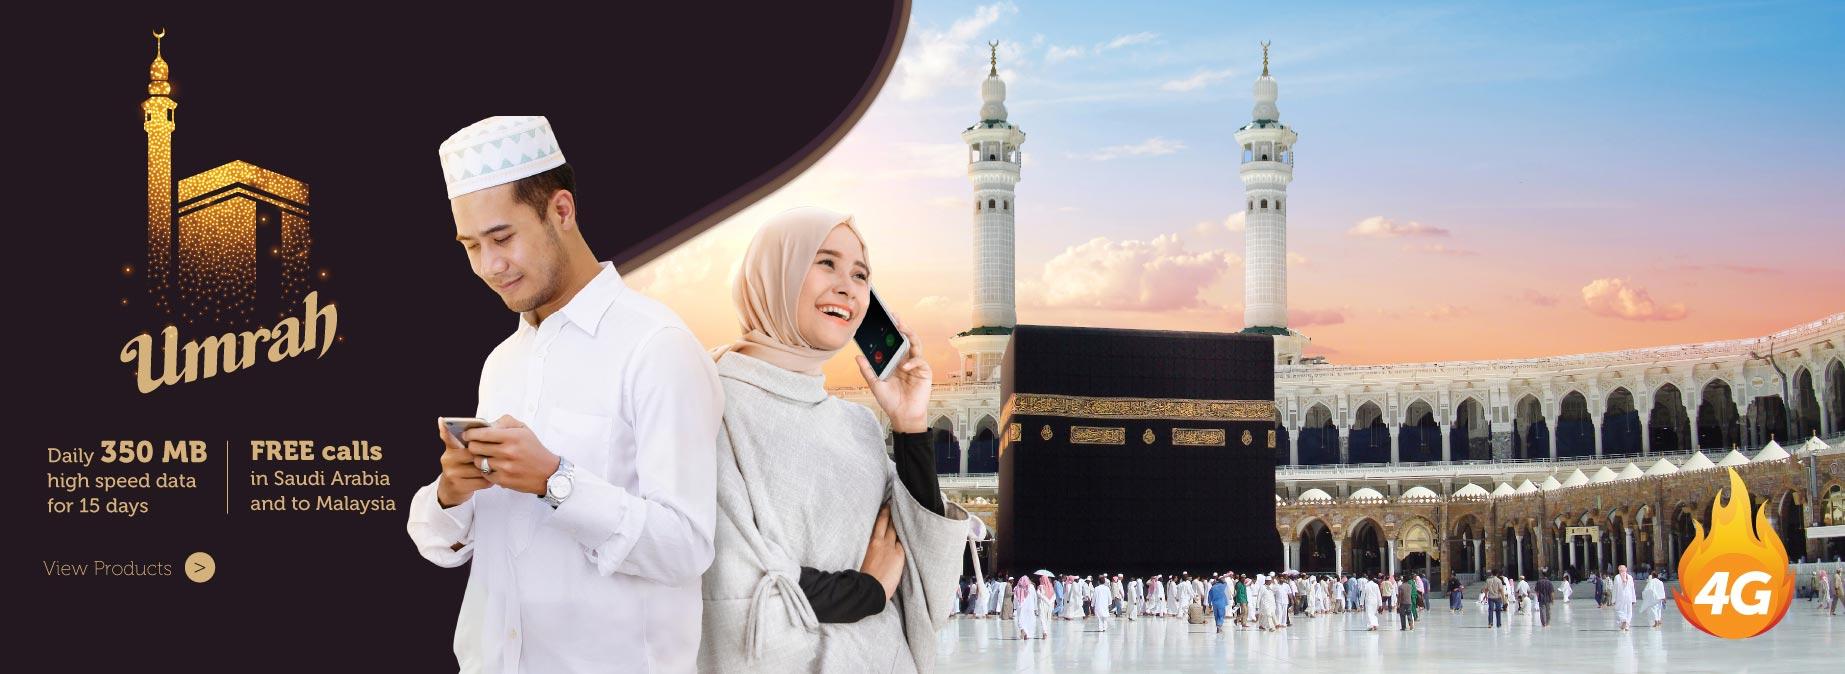 Saudi Arabia Umrah SIM Card